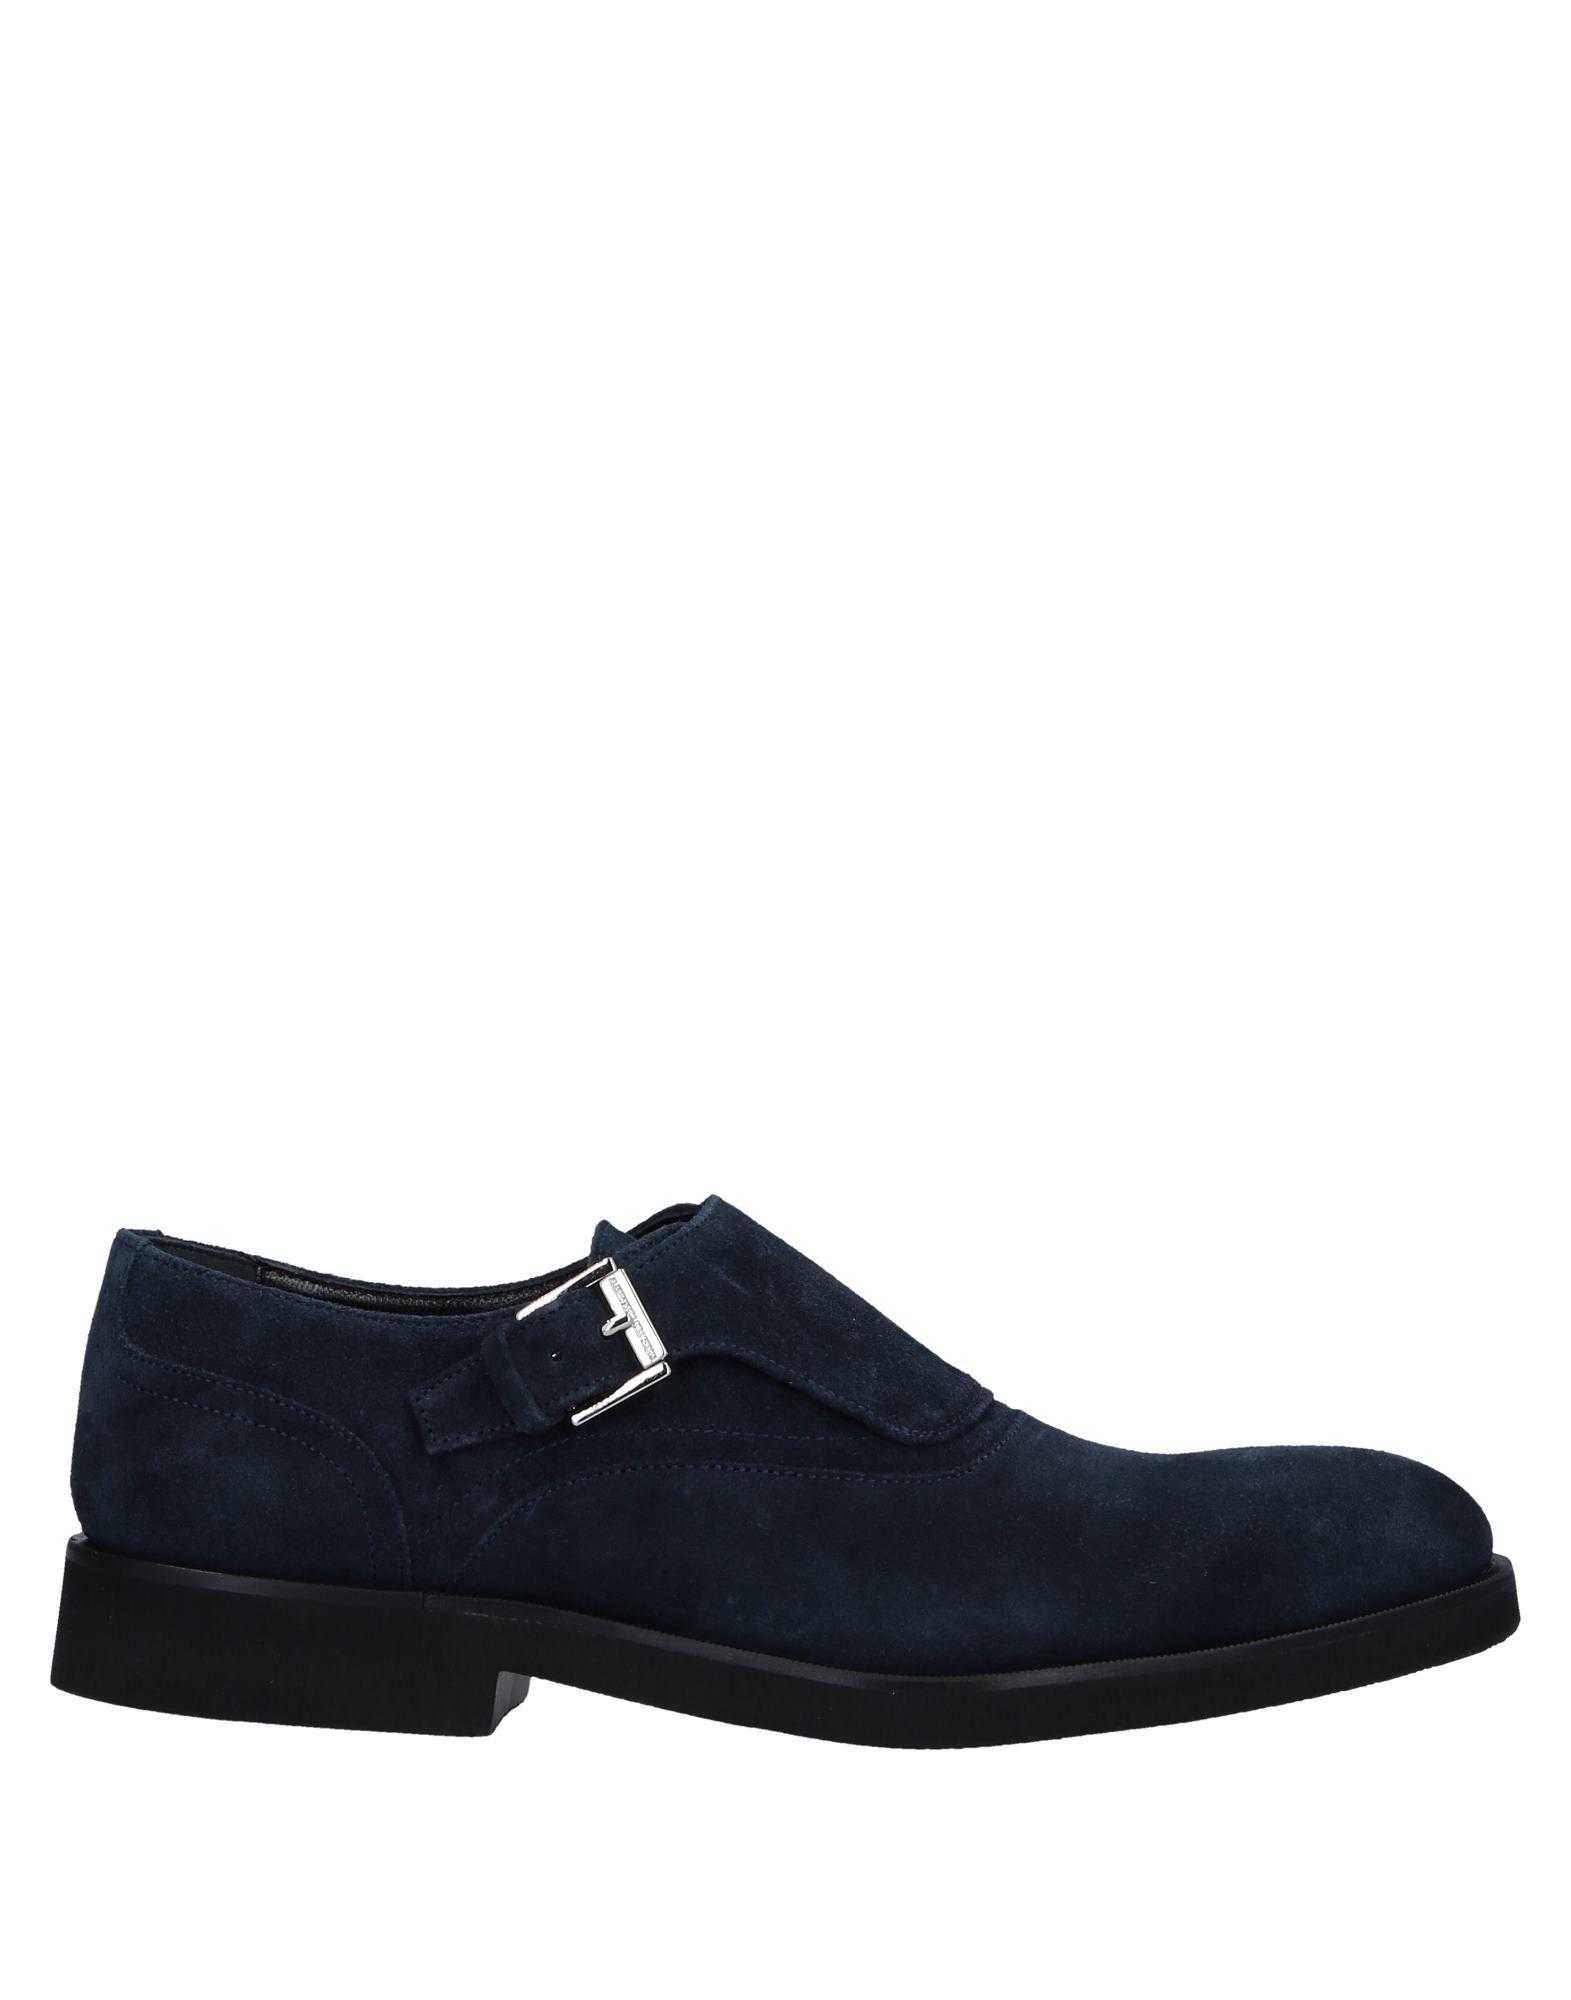 Alessandro Dell'acqua Mokassins Herren  11534882MG Gute Qualität beliebte Schuhe